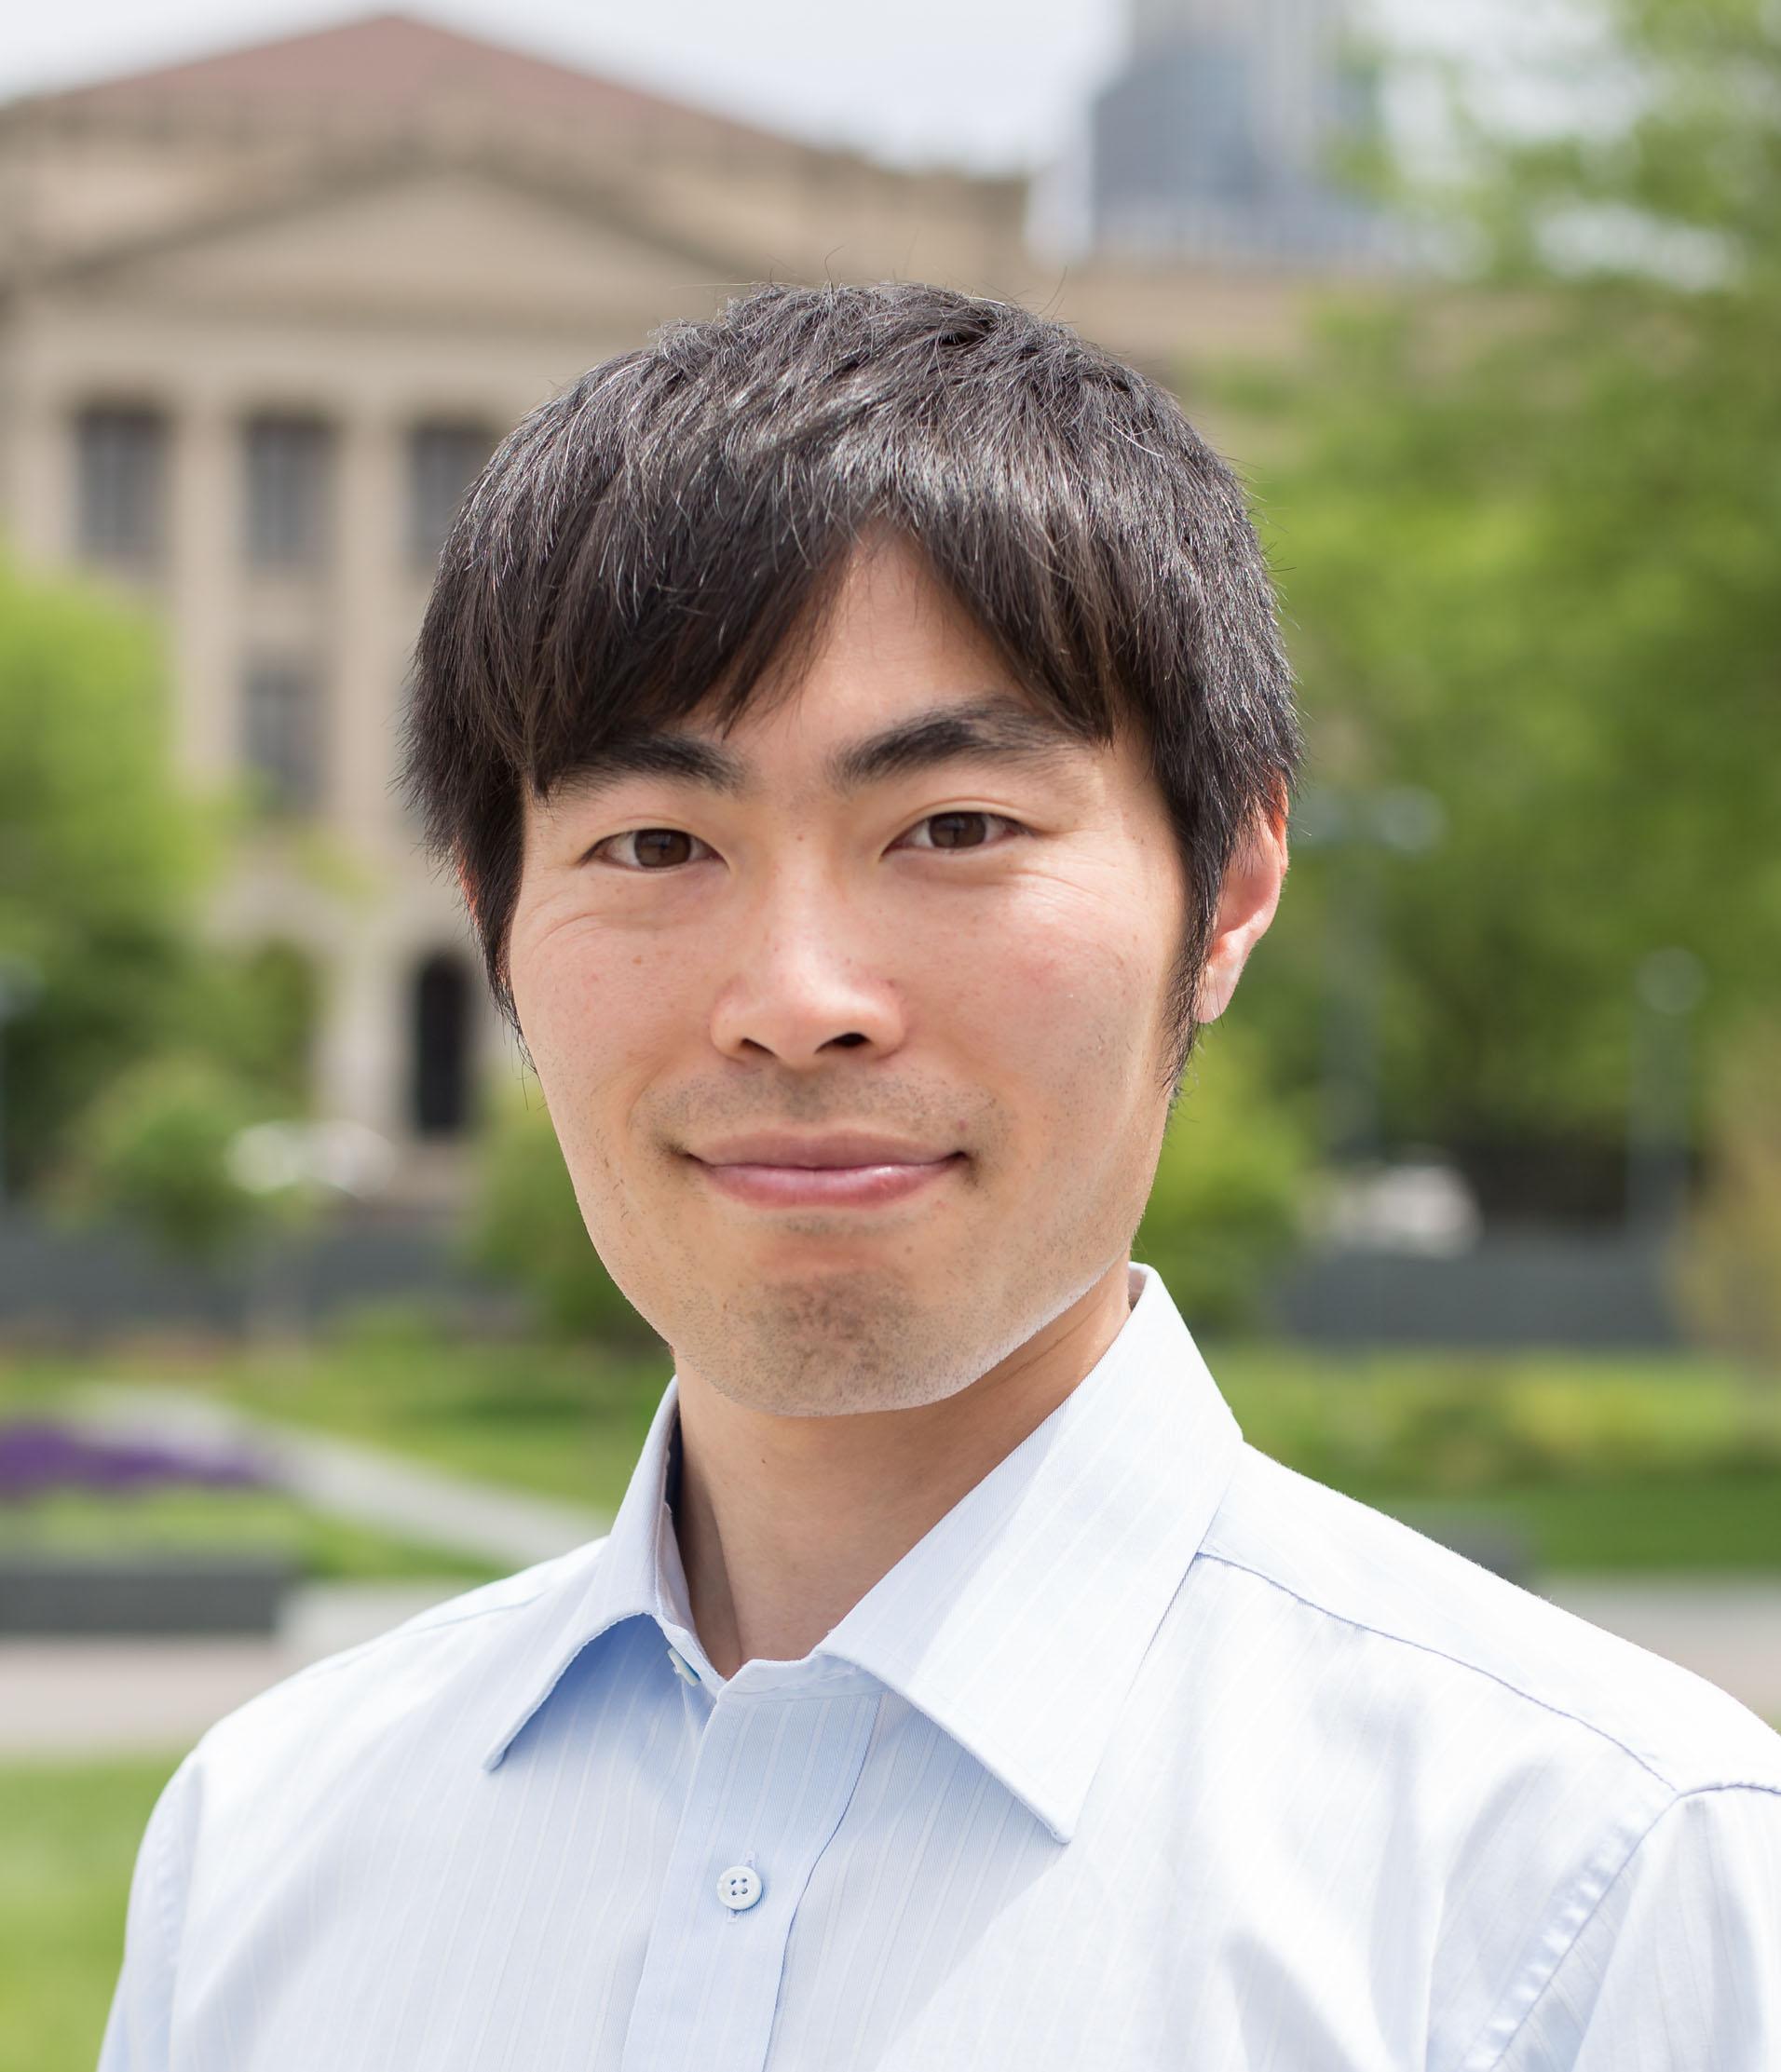 Shinichi Nagata, Ph.D., CTRS